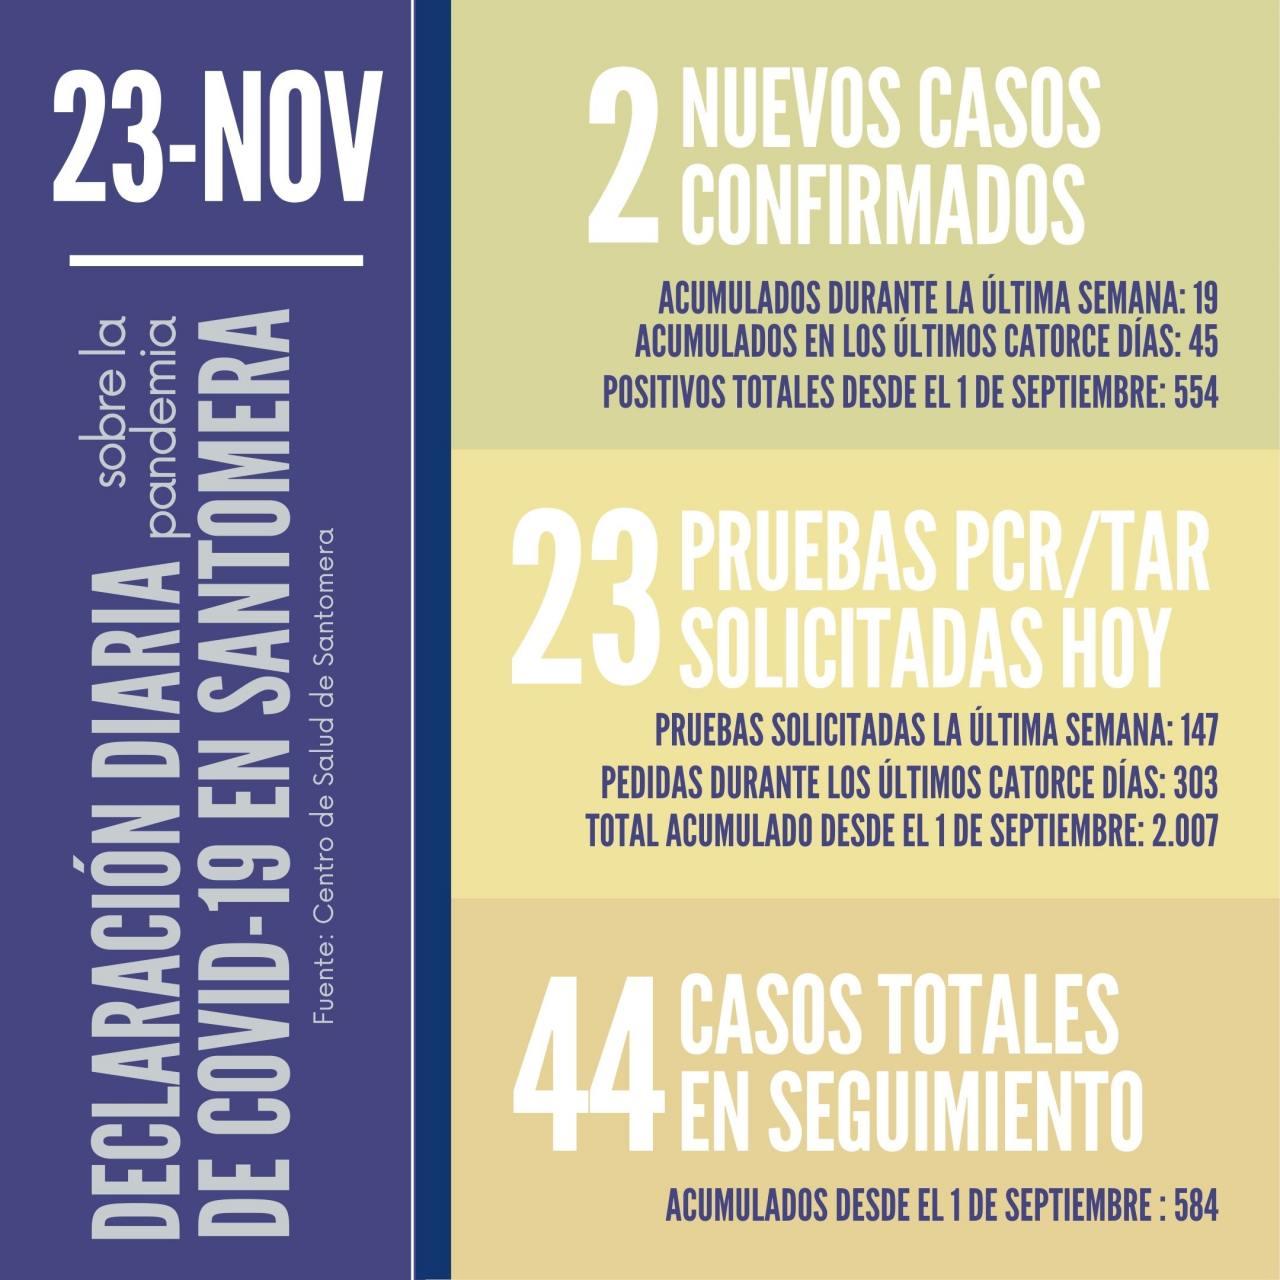 20201123_Datos-COVID-19-Santomera